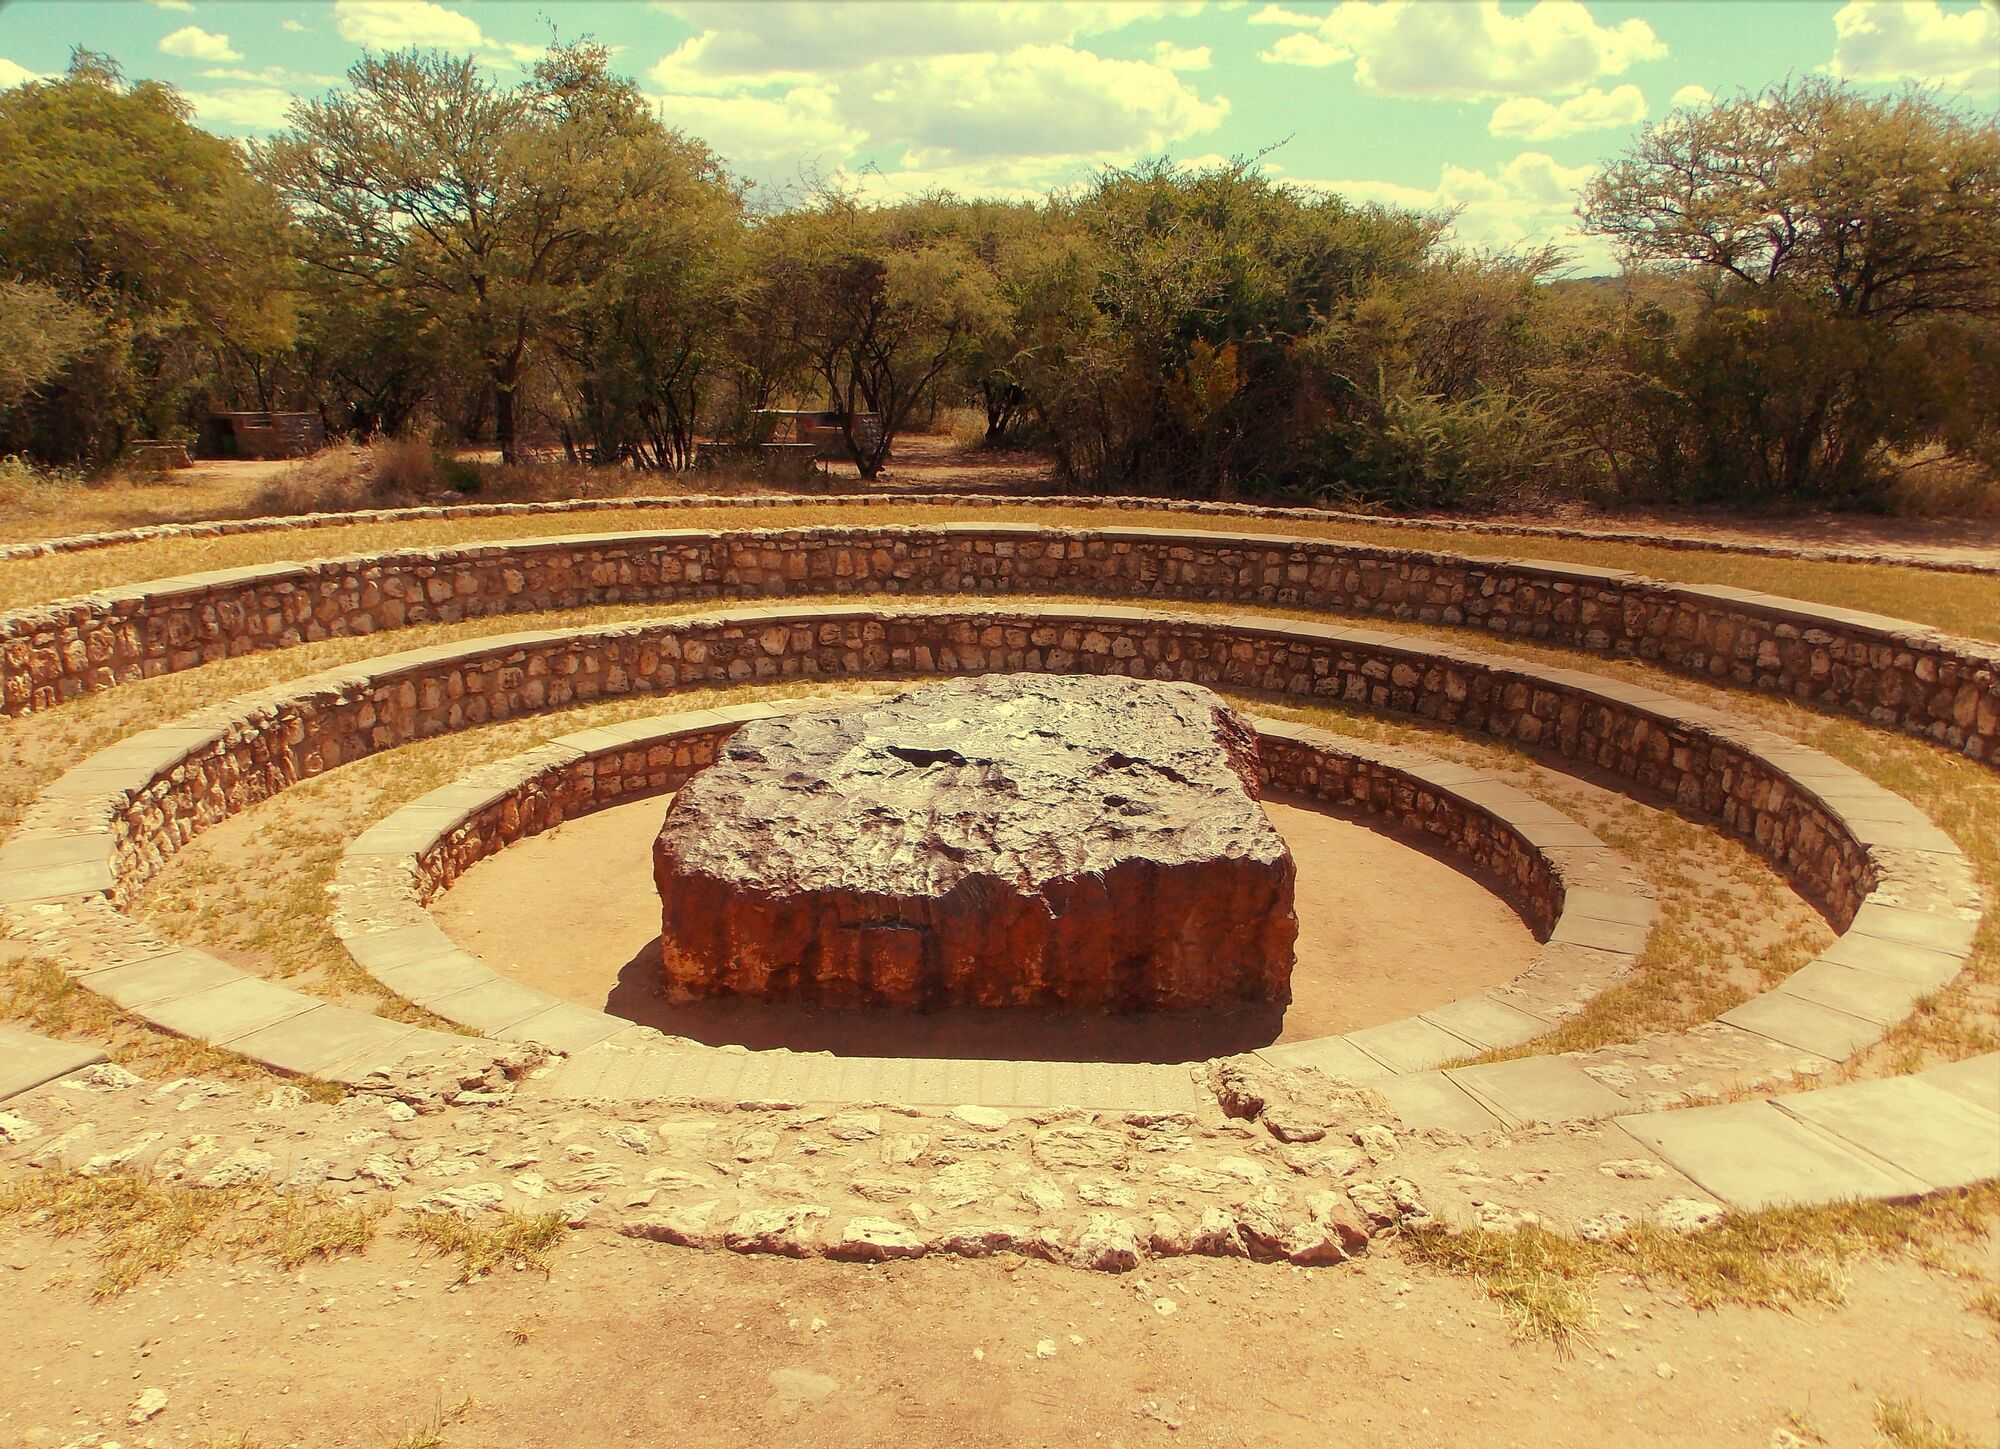 Метеорит Гоба весит около 60 тонн